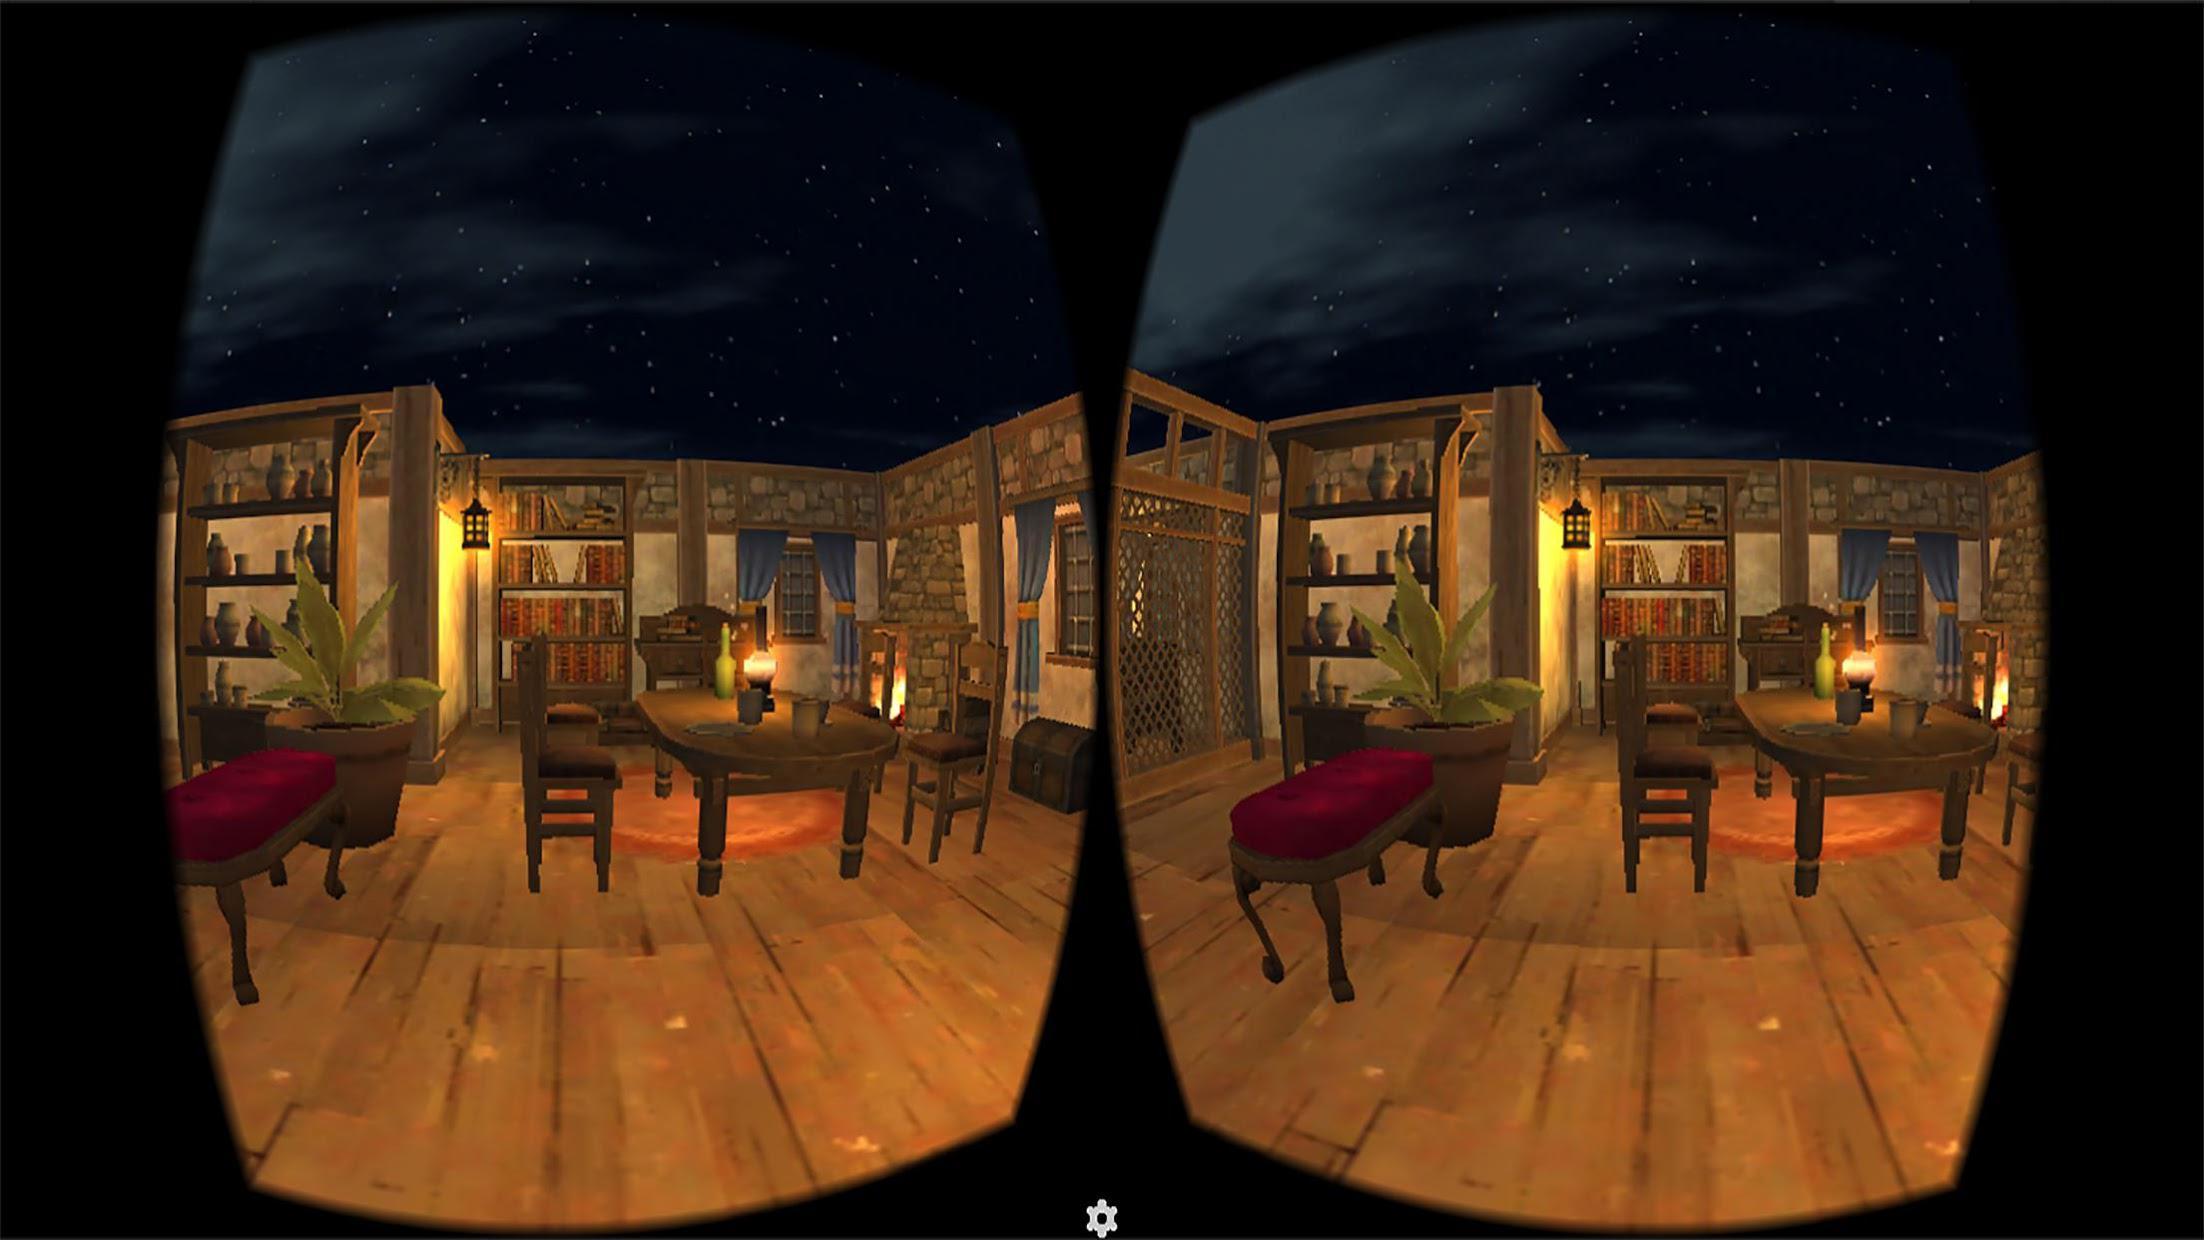 Cardboard Manor Environment 游戏截图4